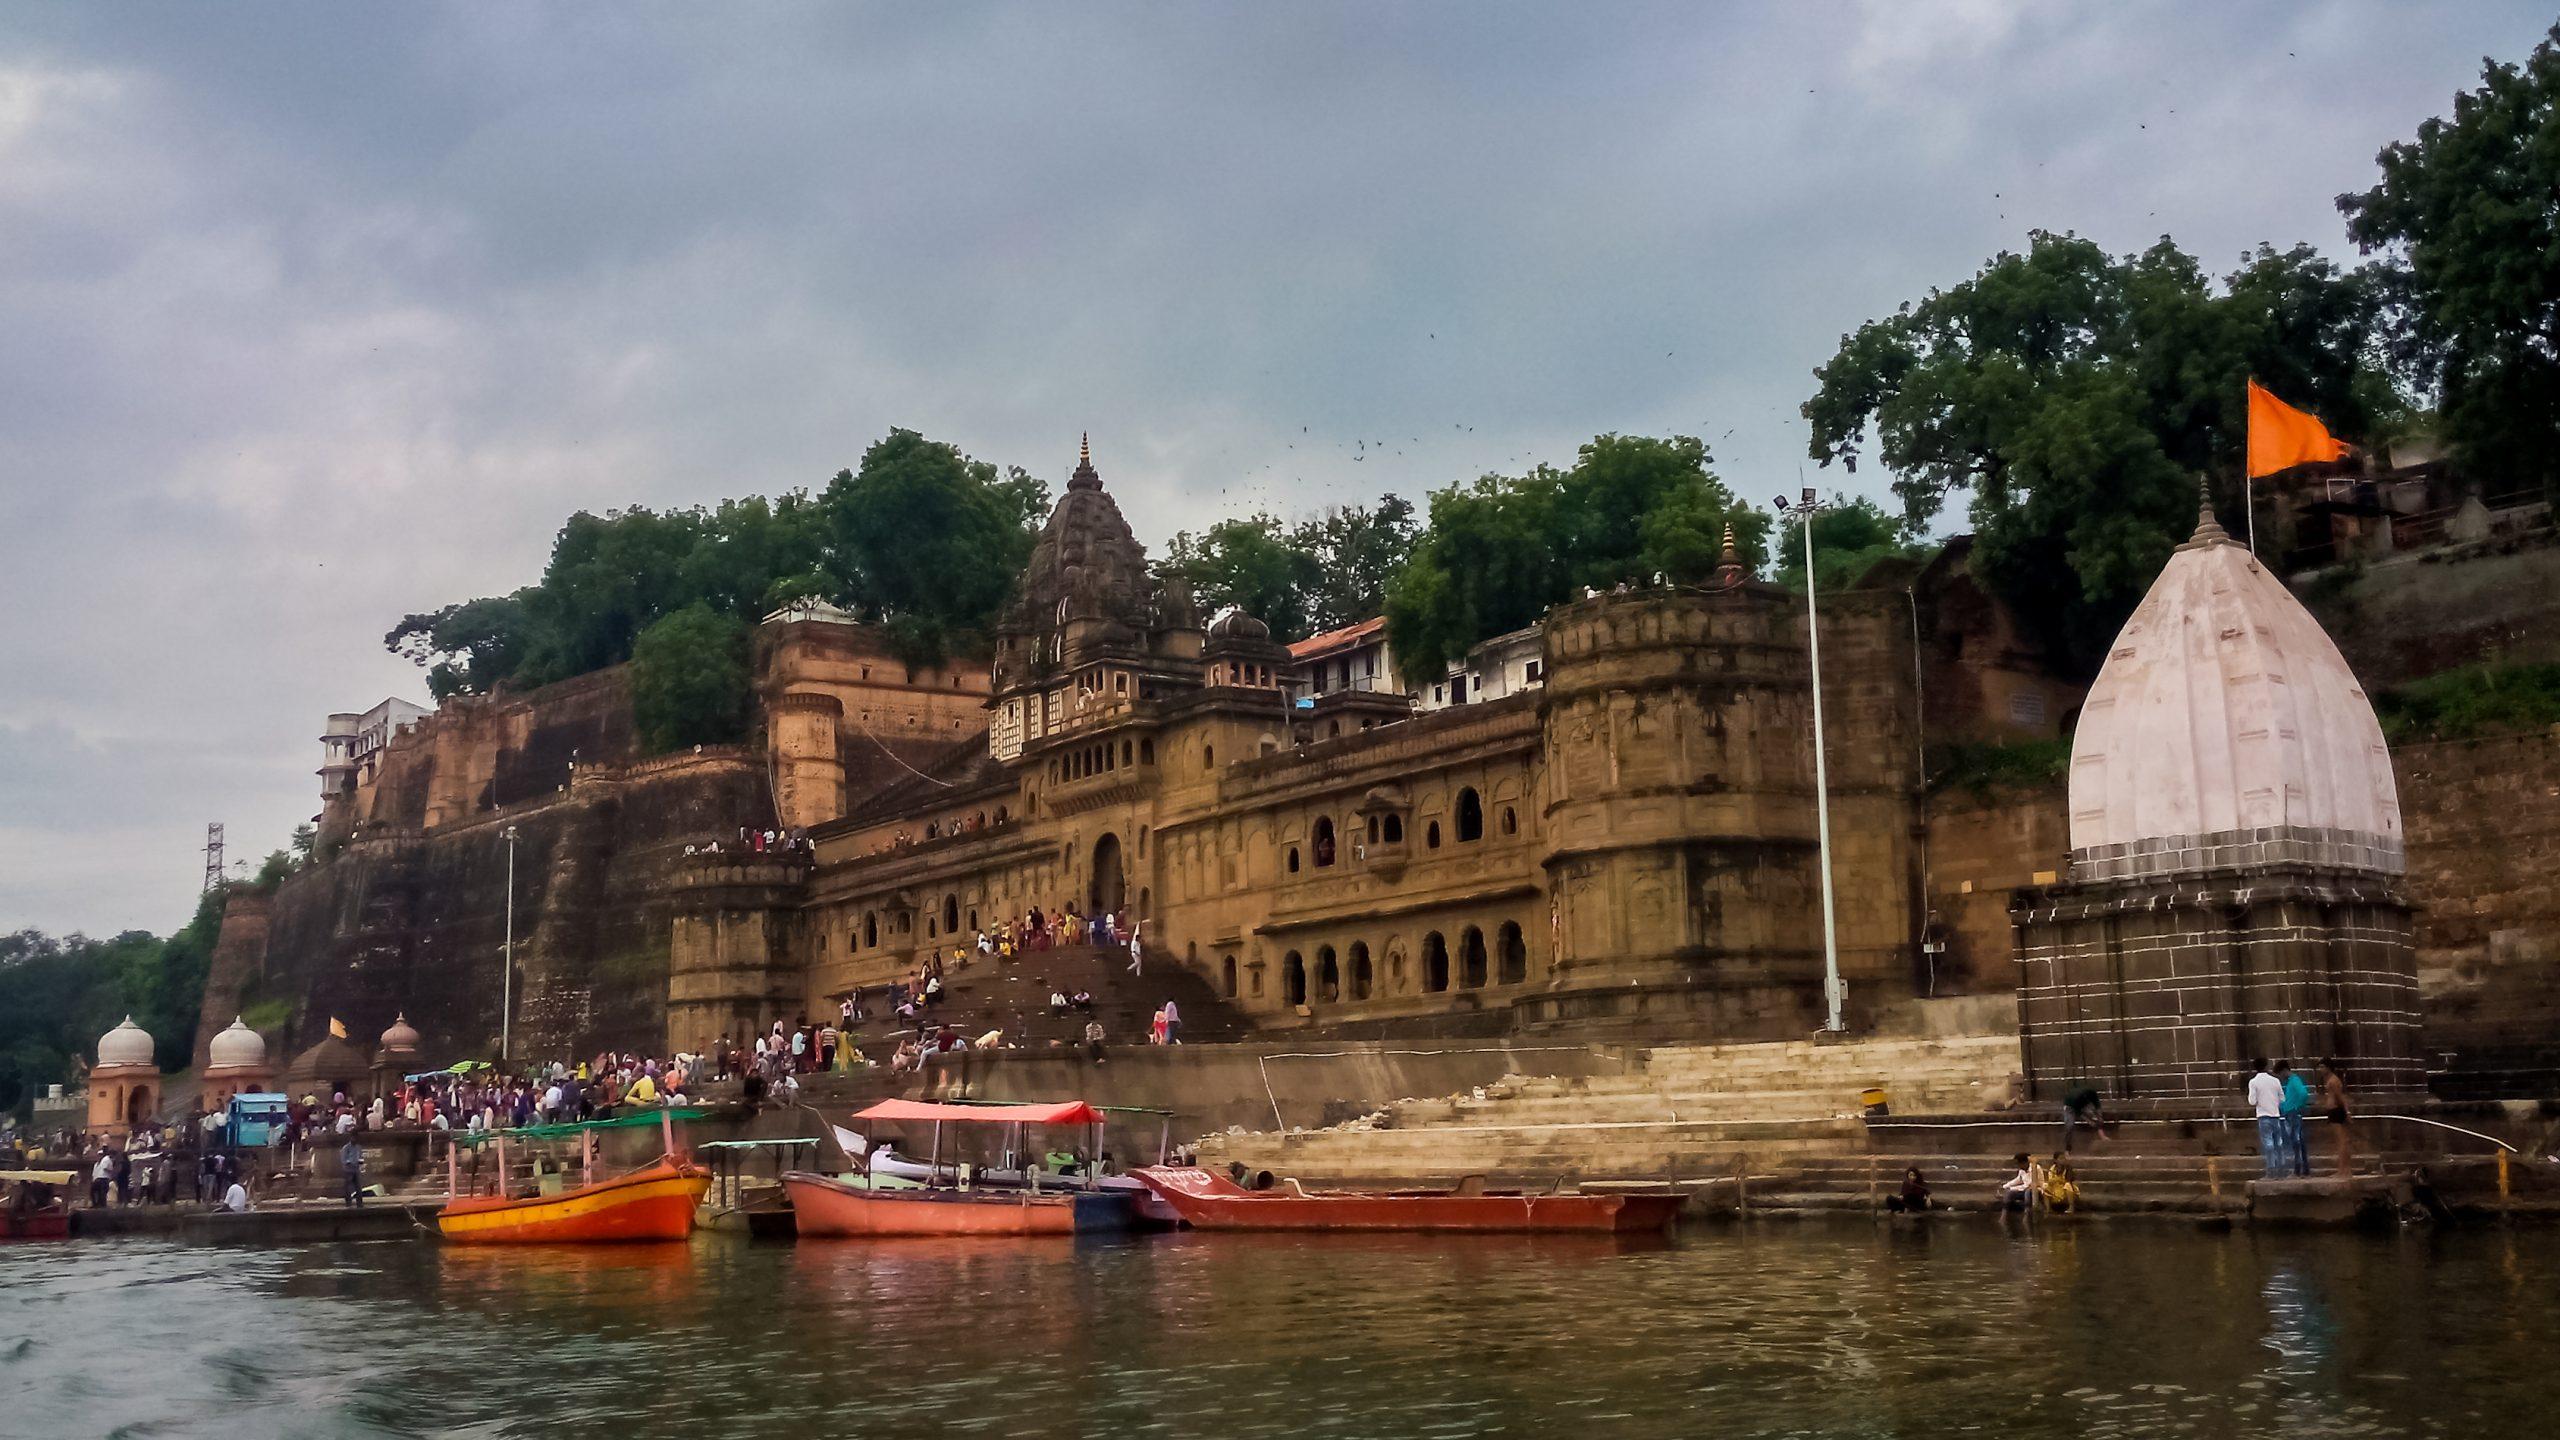 Ahilyawada Maheshwar temple